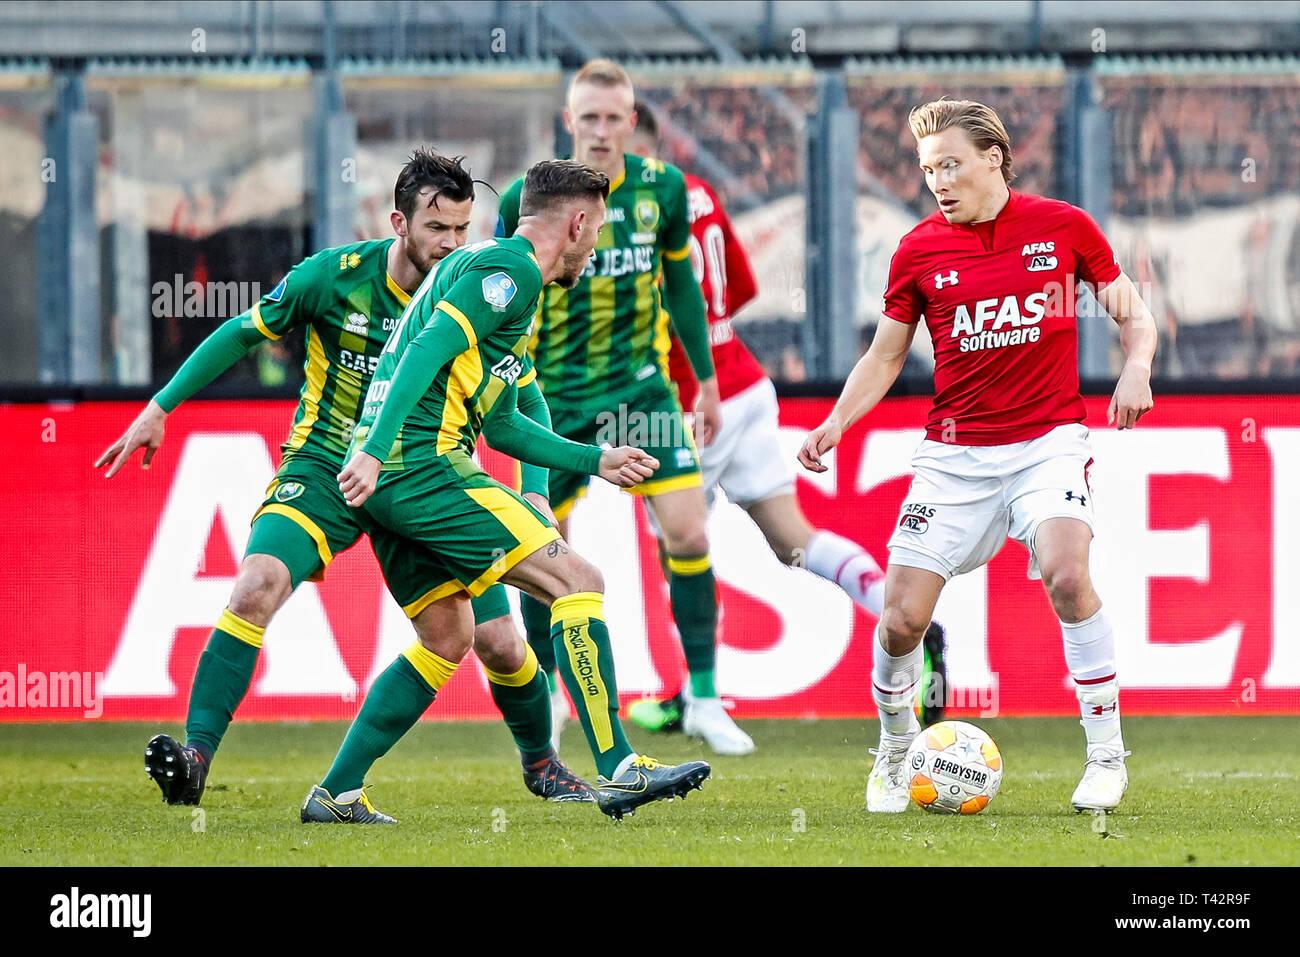 Alkmaar Az Ado Den Haag 13 04 2019 Football Dutch Eredivisie Season 2018 2019 Afas Stadium